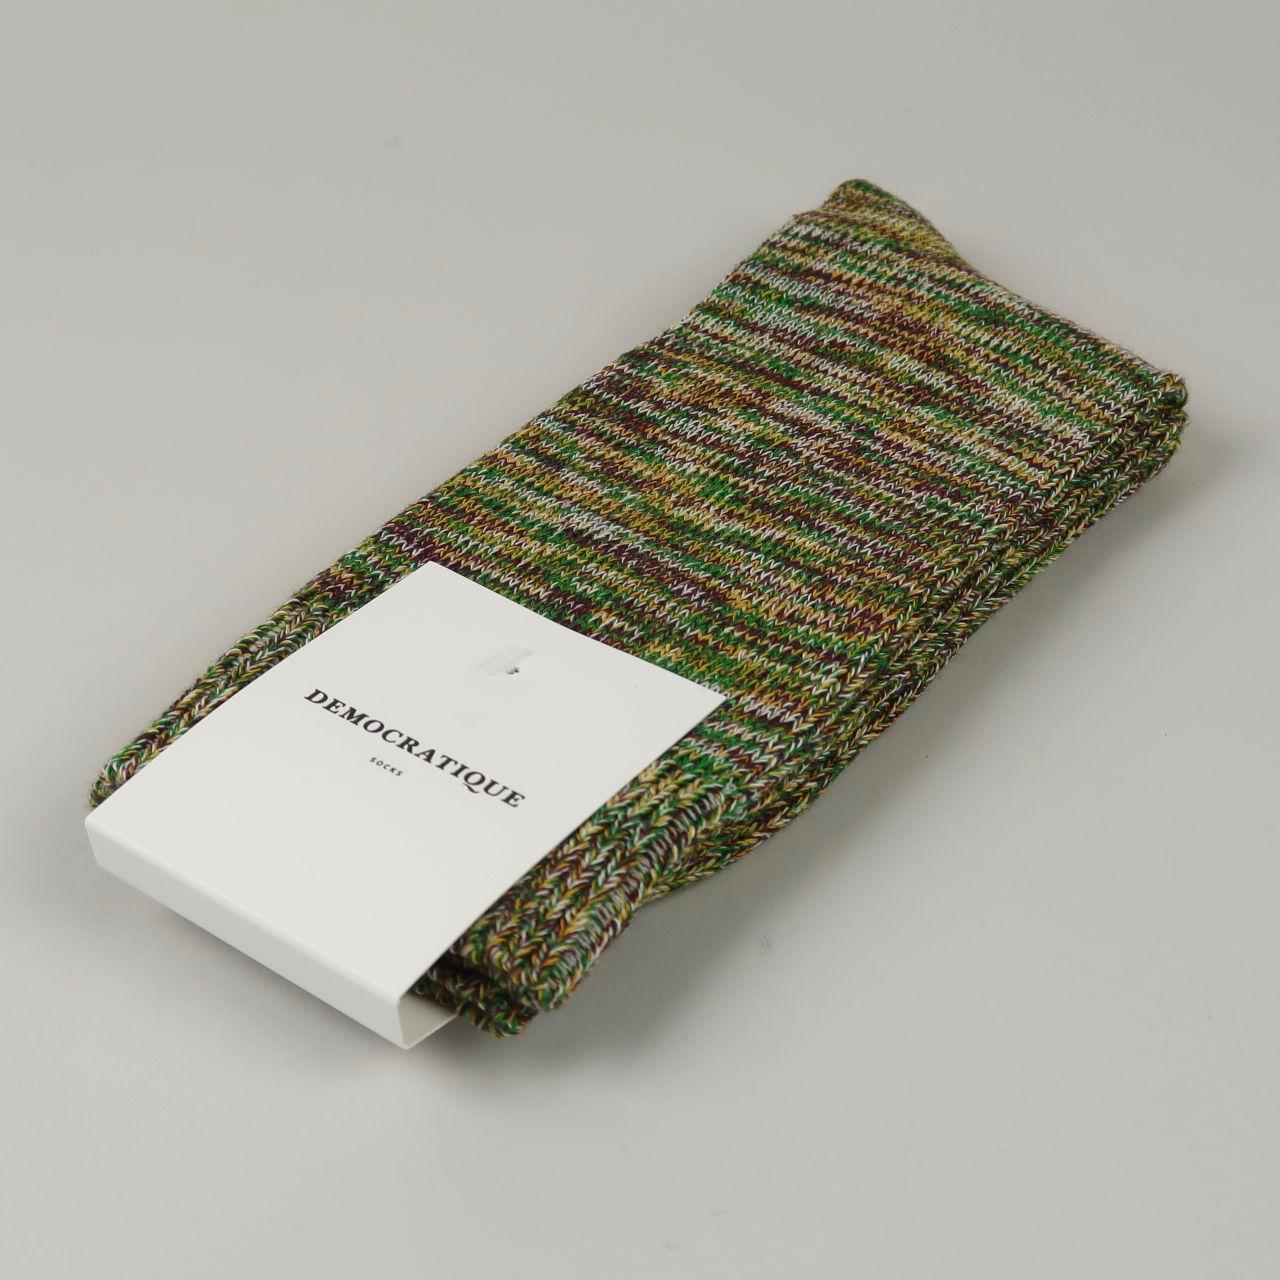 Men's Socks - Relax Chunky Knit - Hot Curry/Dark Plum/Off White/Grass Green